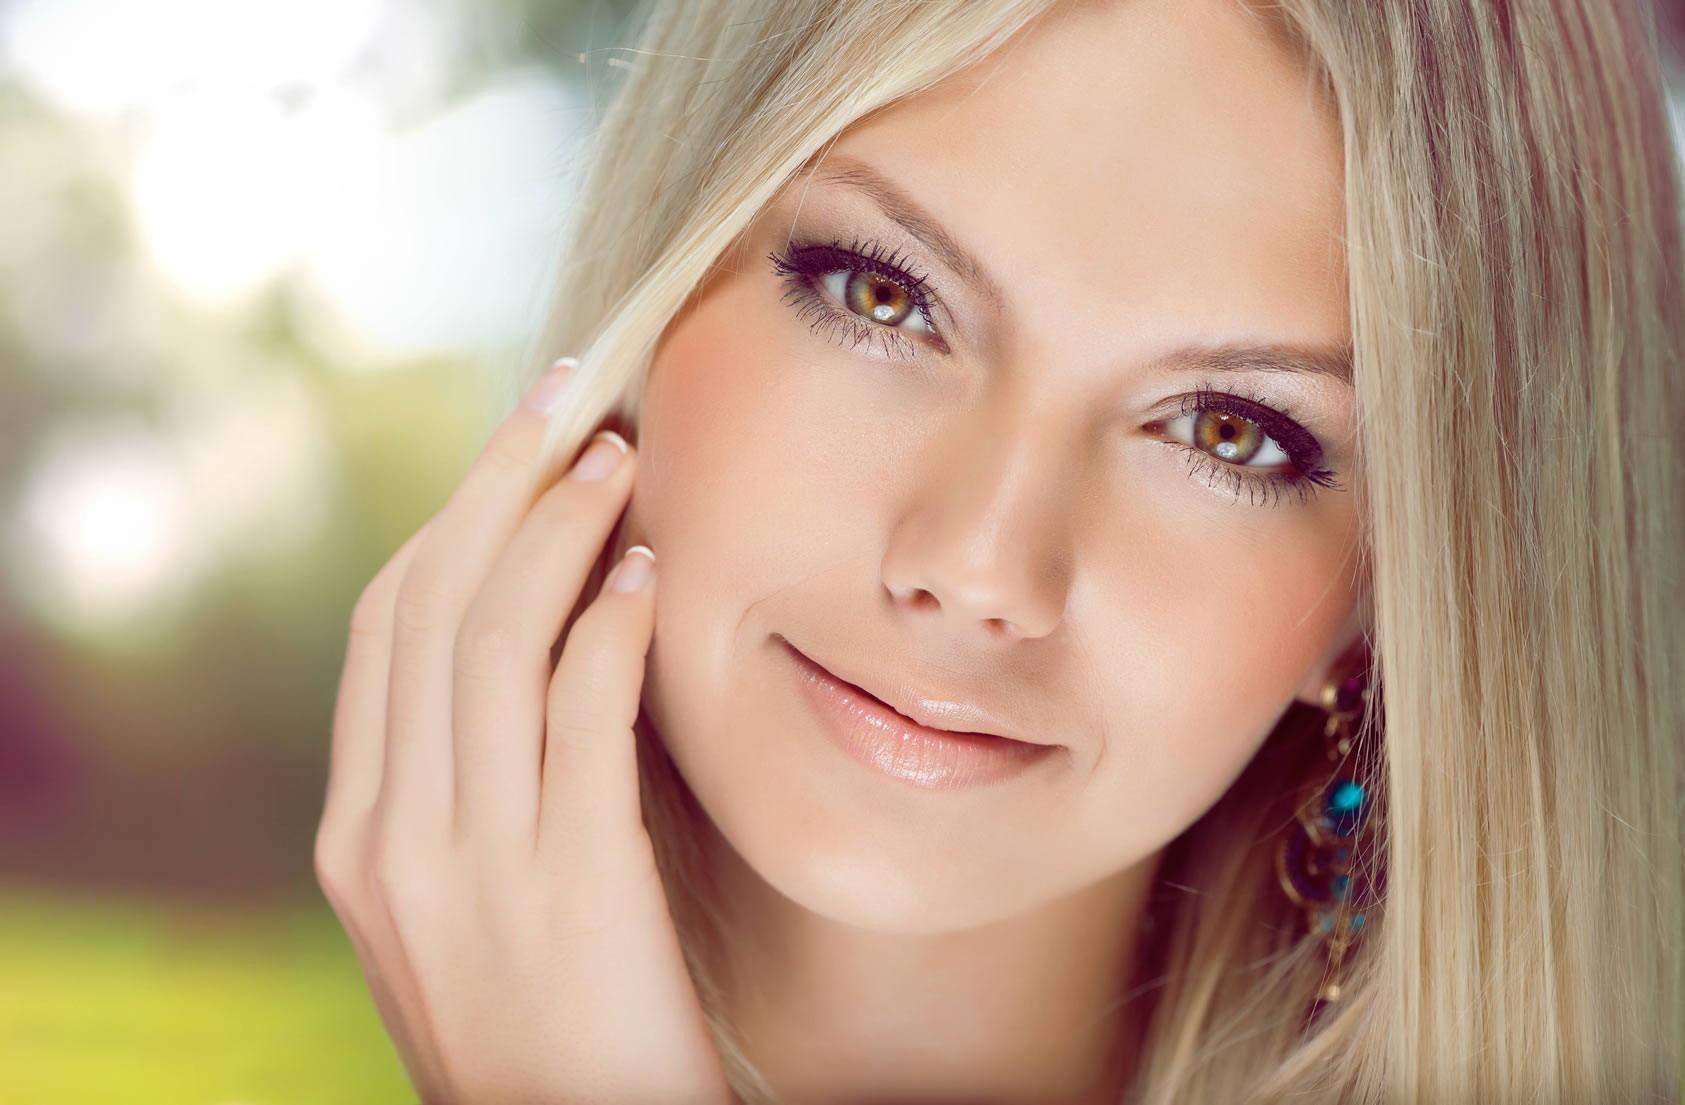 http://www.femsclub.ru/wp-content/uploads/2013/11/fotolia_41806861_subscription_xxl.jpg